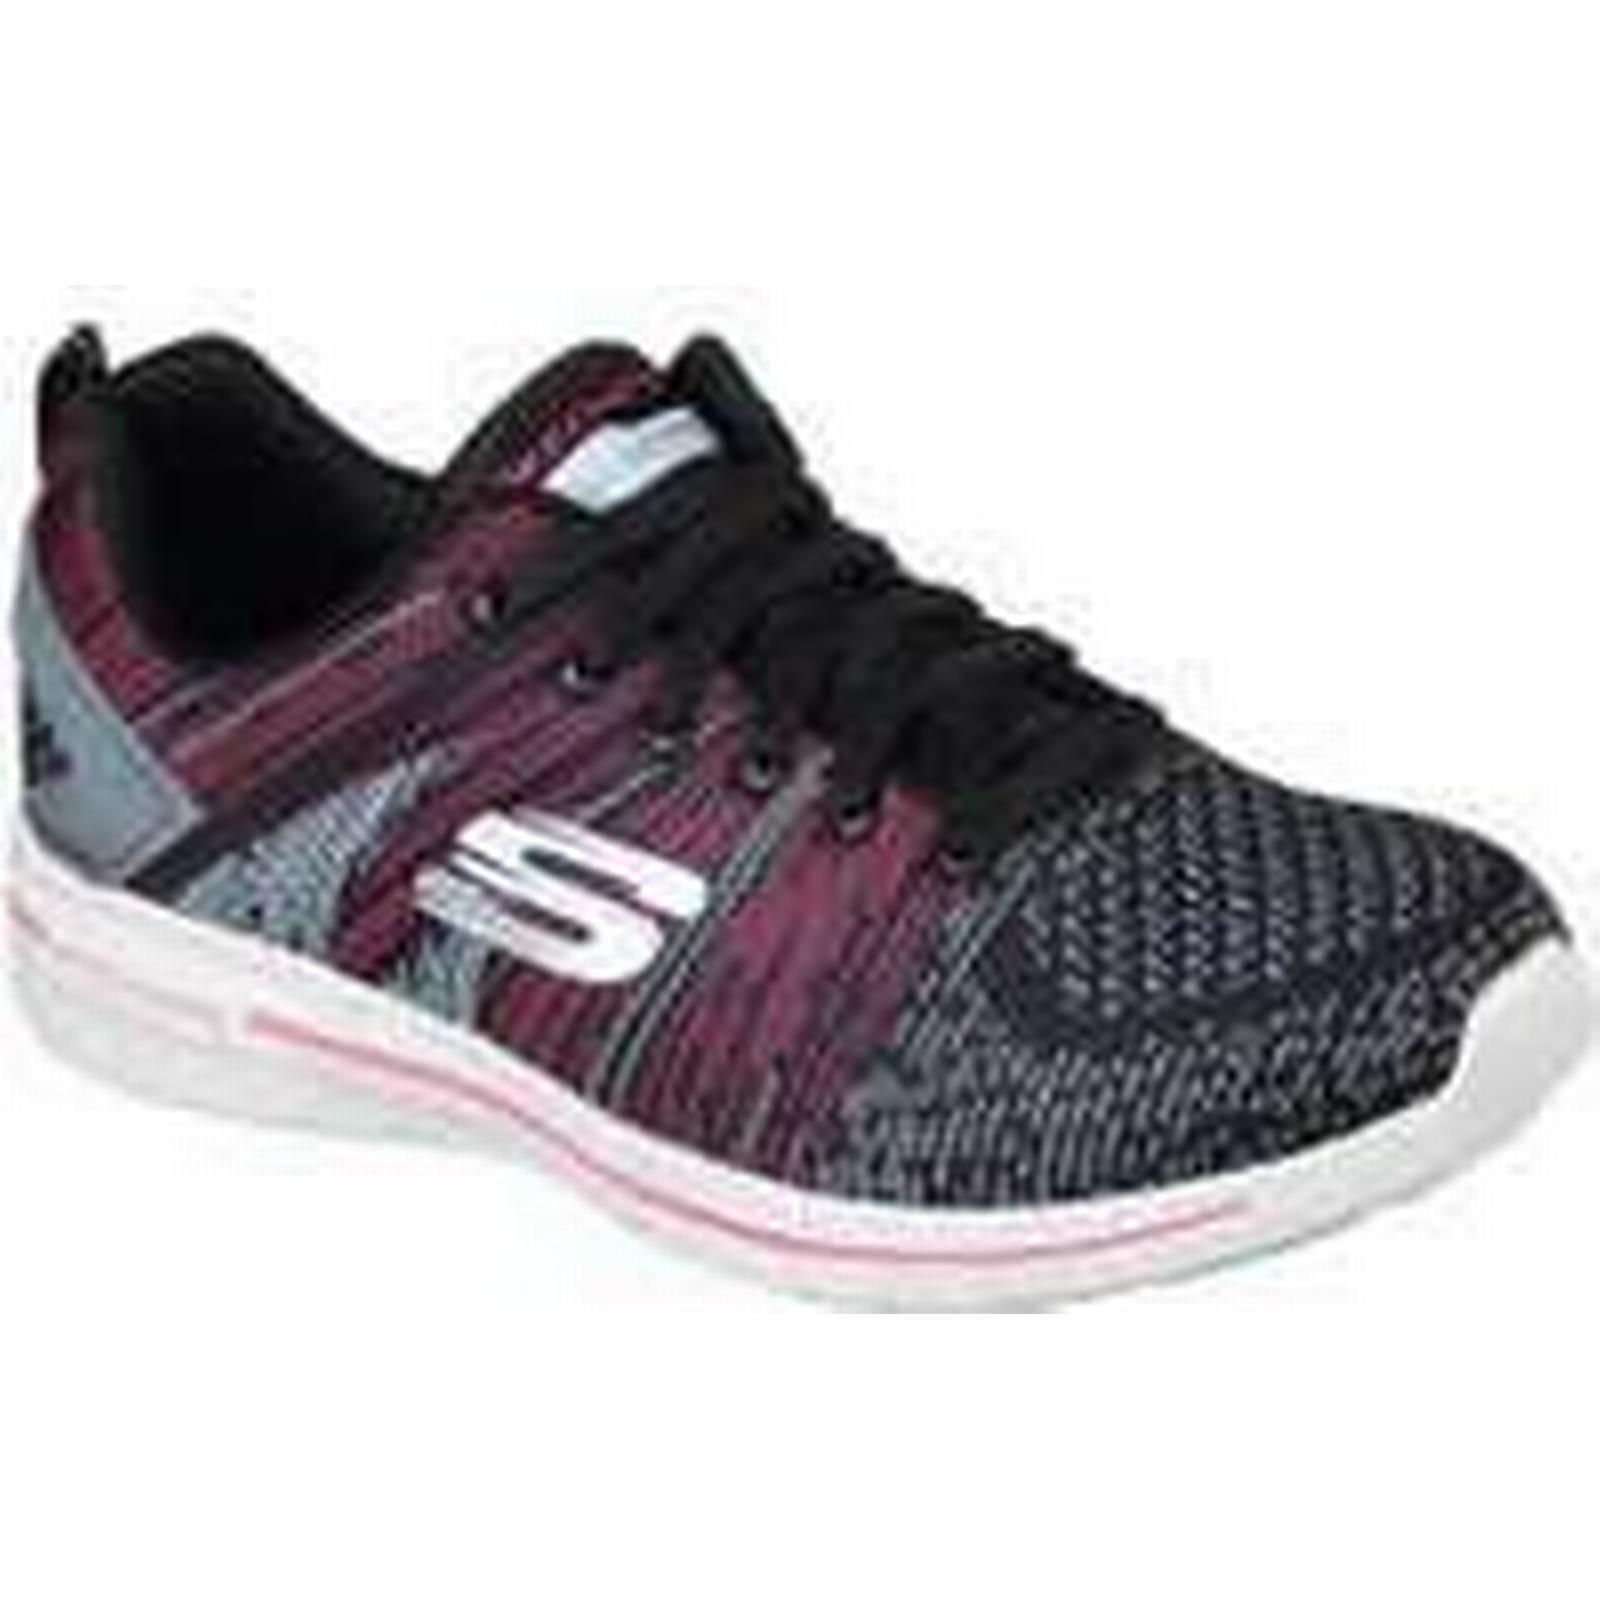 Skechers Shoes Burst 2.0 Ladies Walking Shoes Skechers - Pink/Black, 8 UK d4bbc3